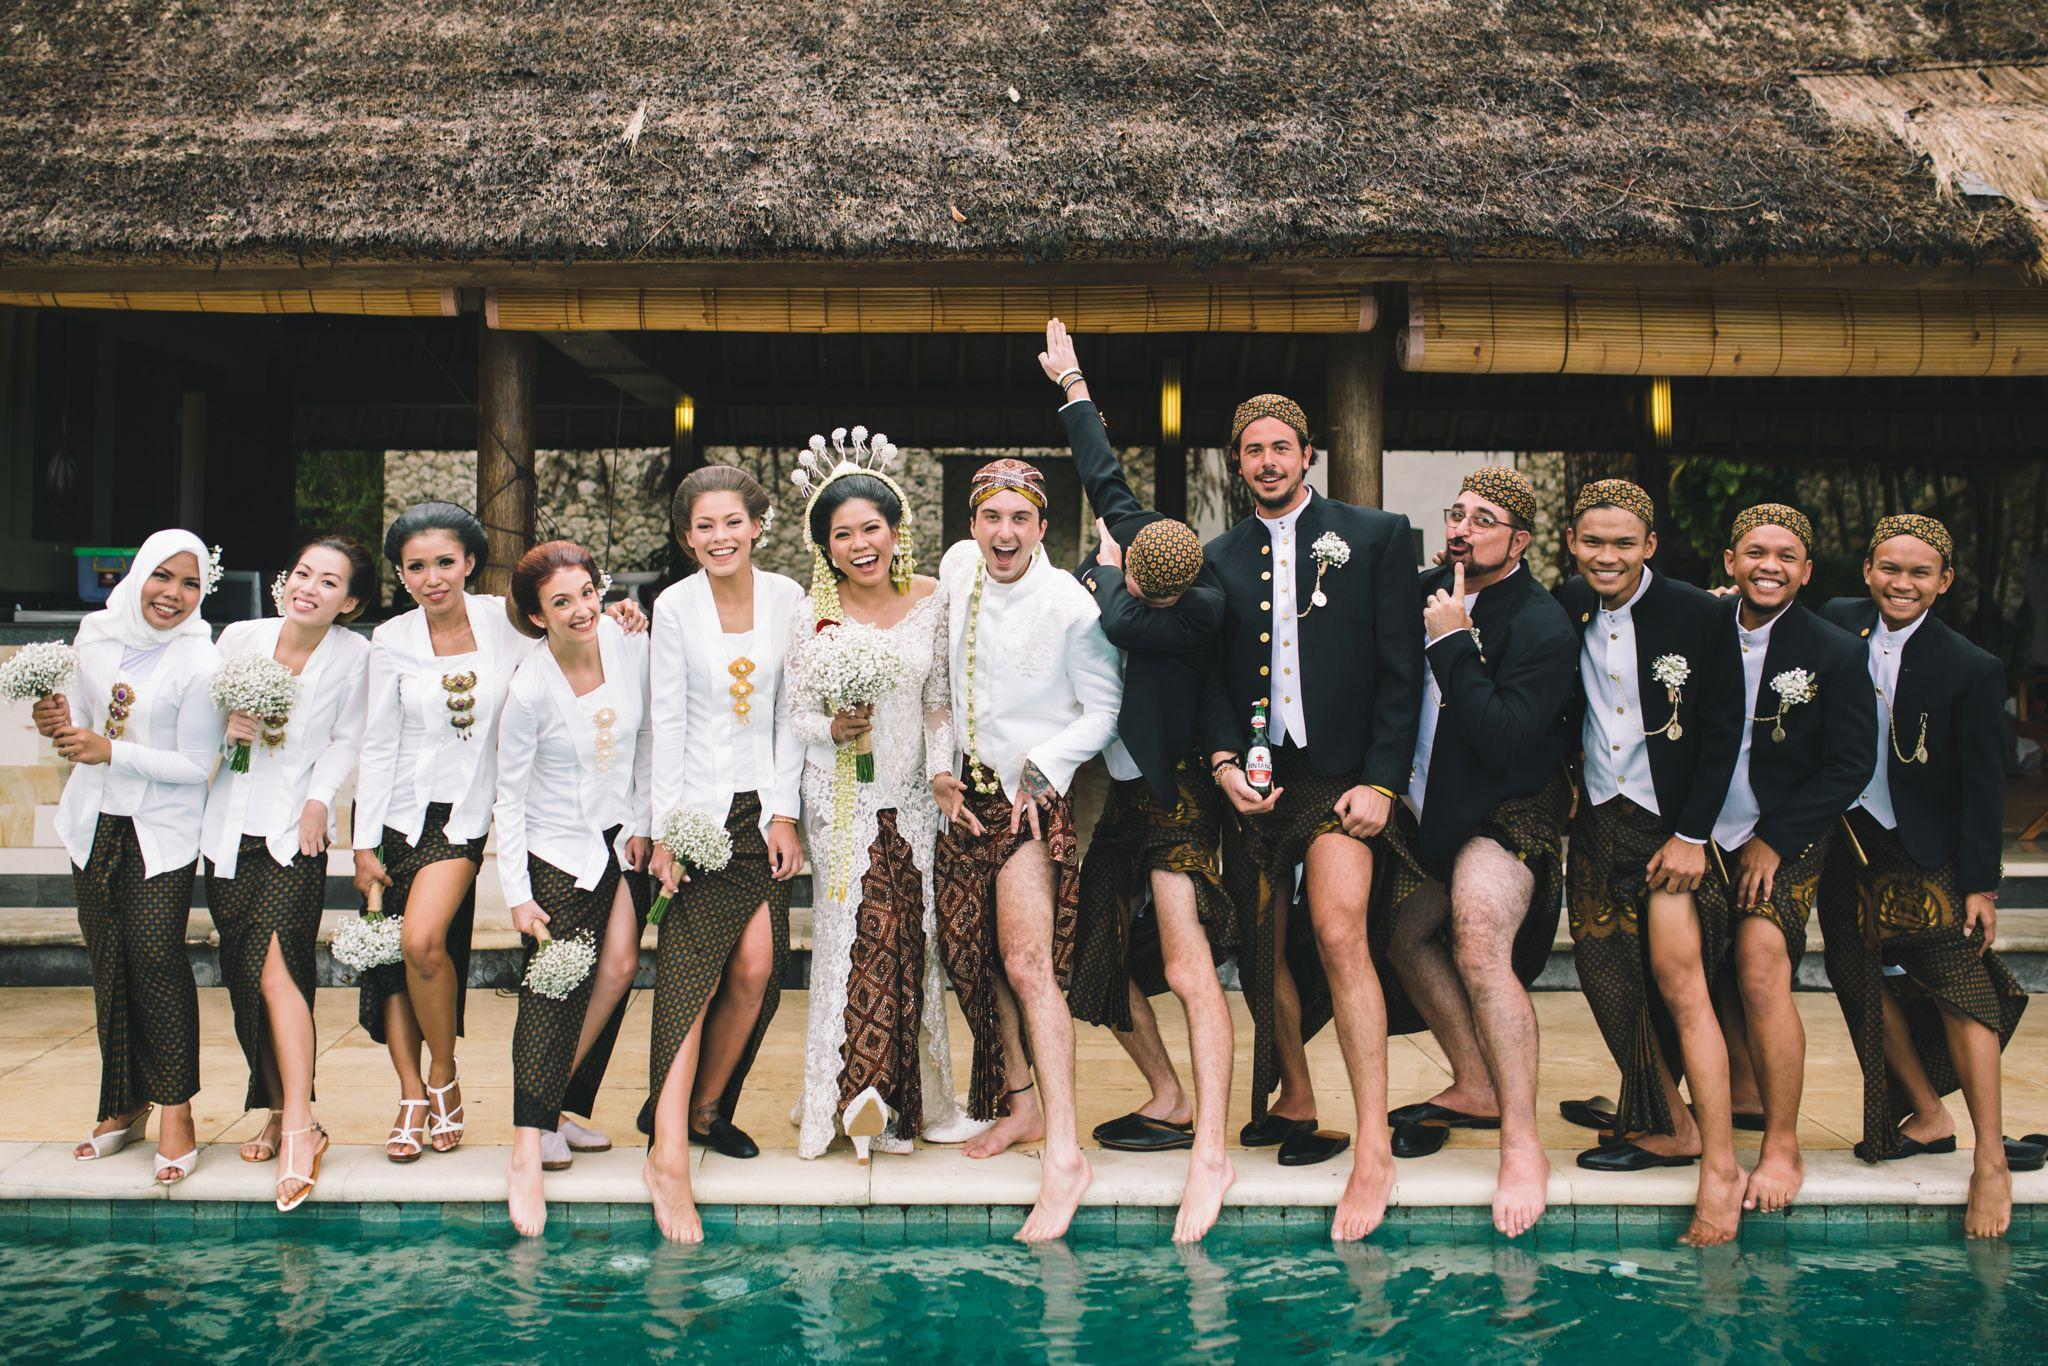 Javanese Traditional Wedding Of Indonesian And Italian In Bali In 2020 Javanese Wedding Indonesian Wedding Wedding Squad